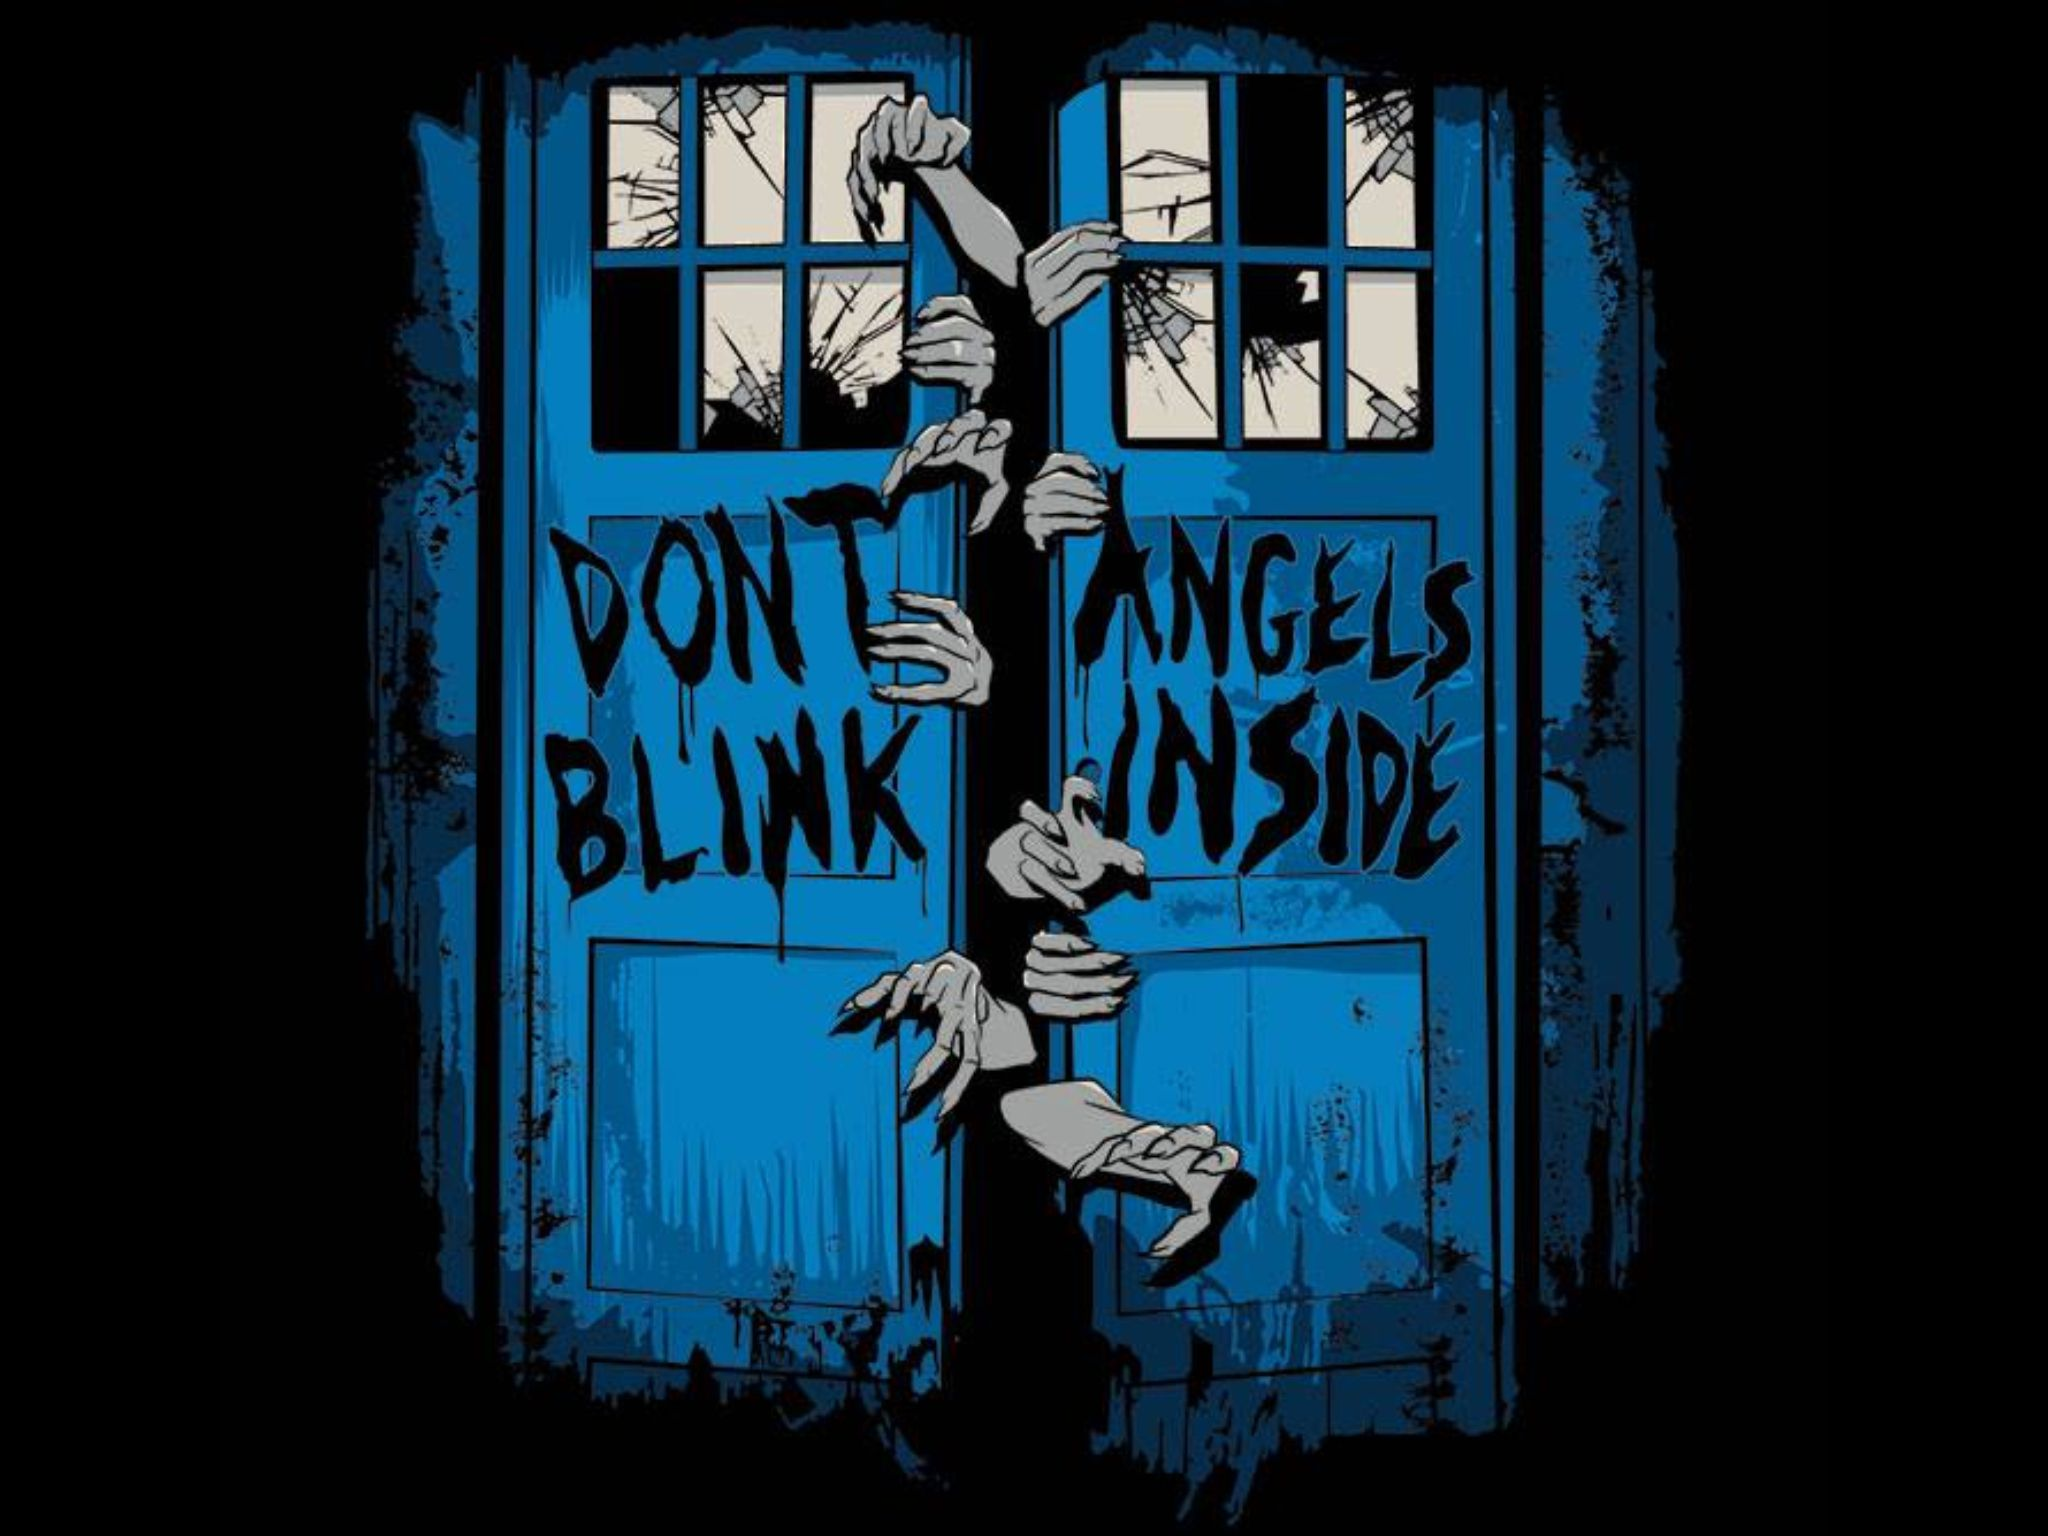 Don't Blink, Angels inside Doctor who, Doctor